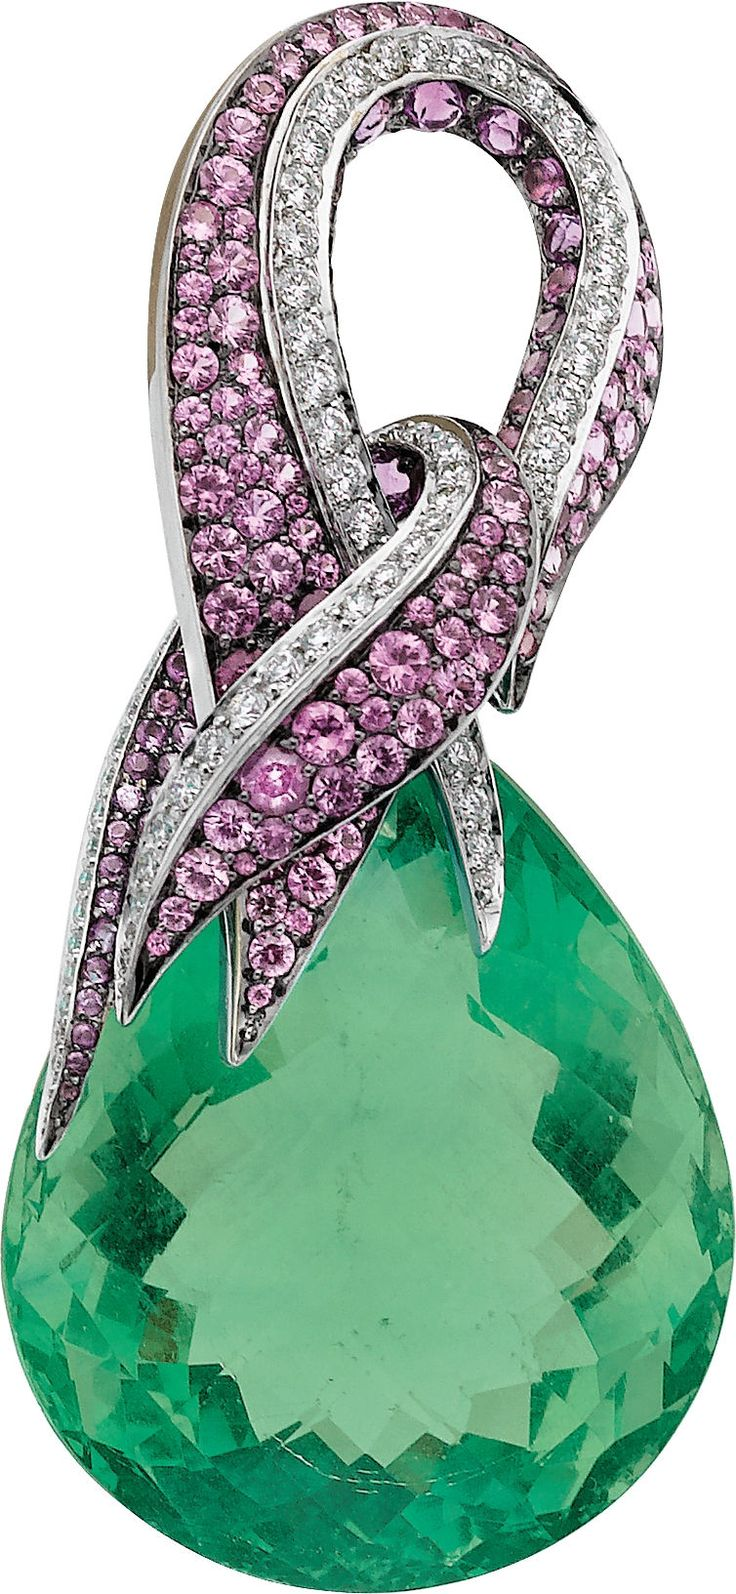 279 best Mauboussin images on Pinterest | Fine jewelry, Jewelry ...